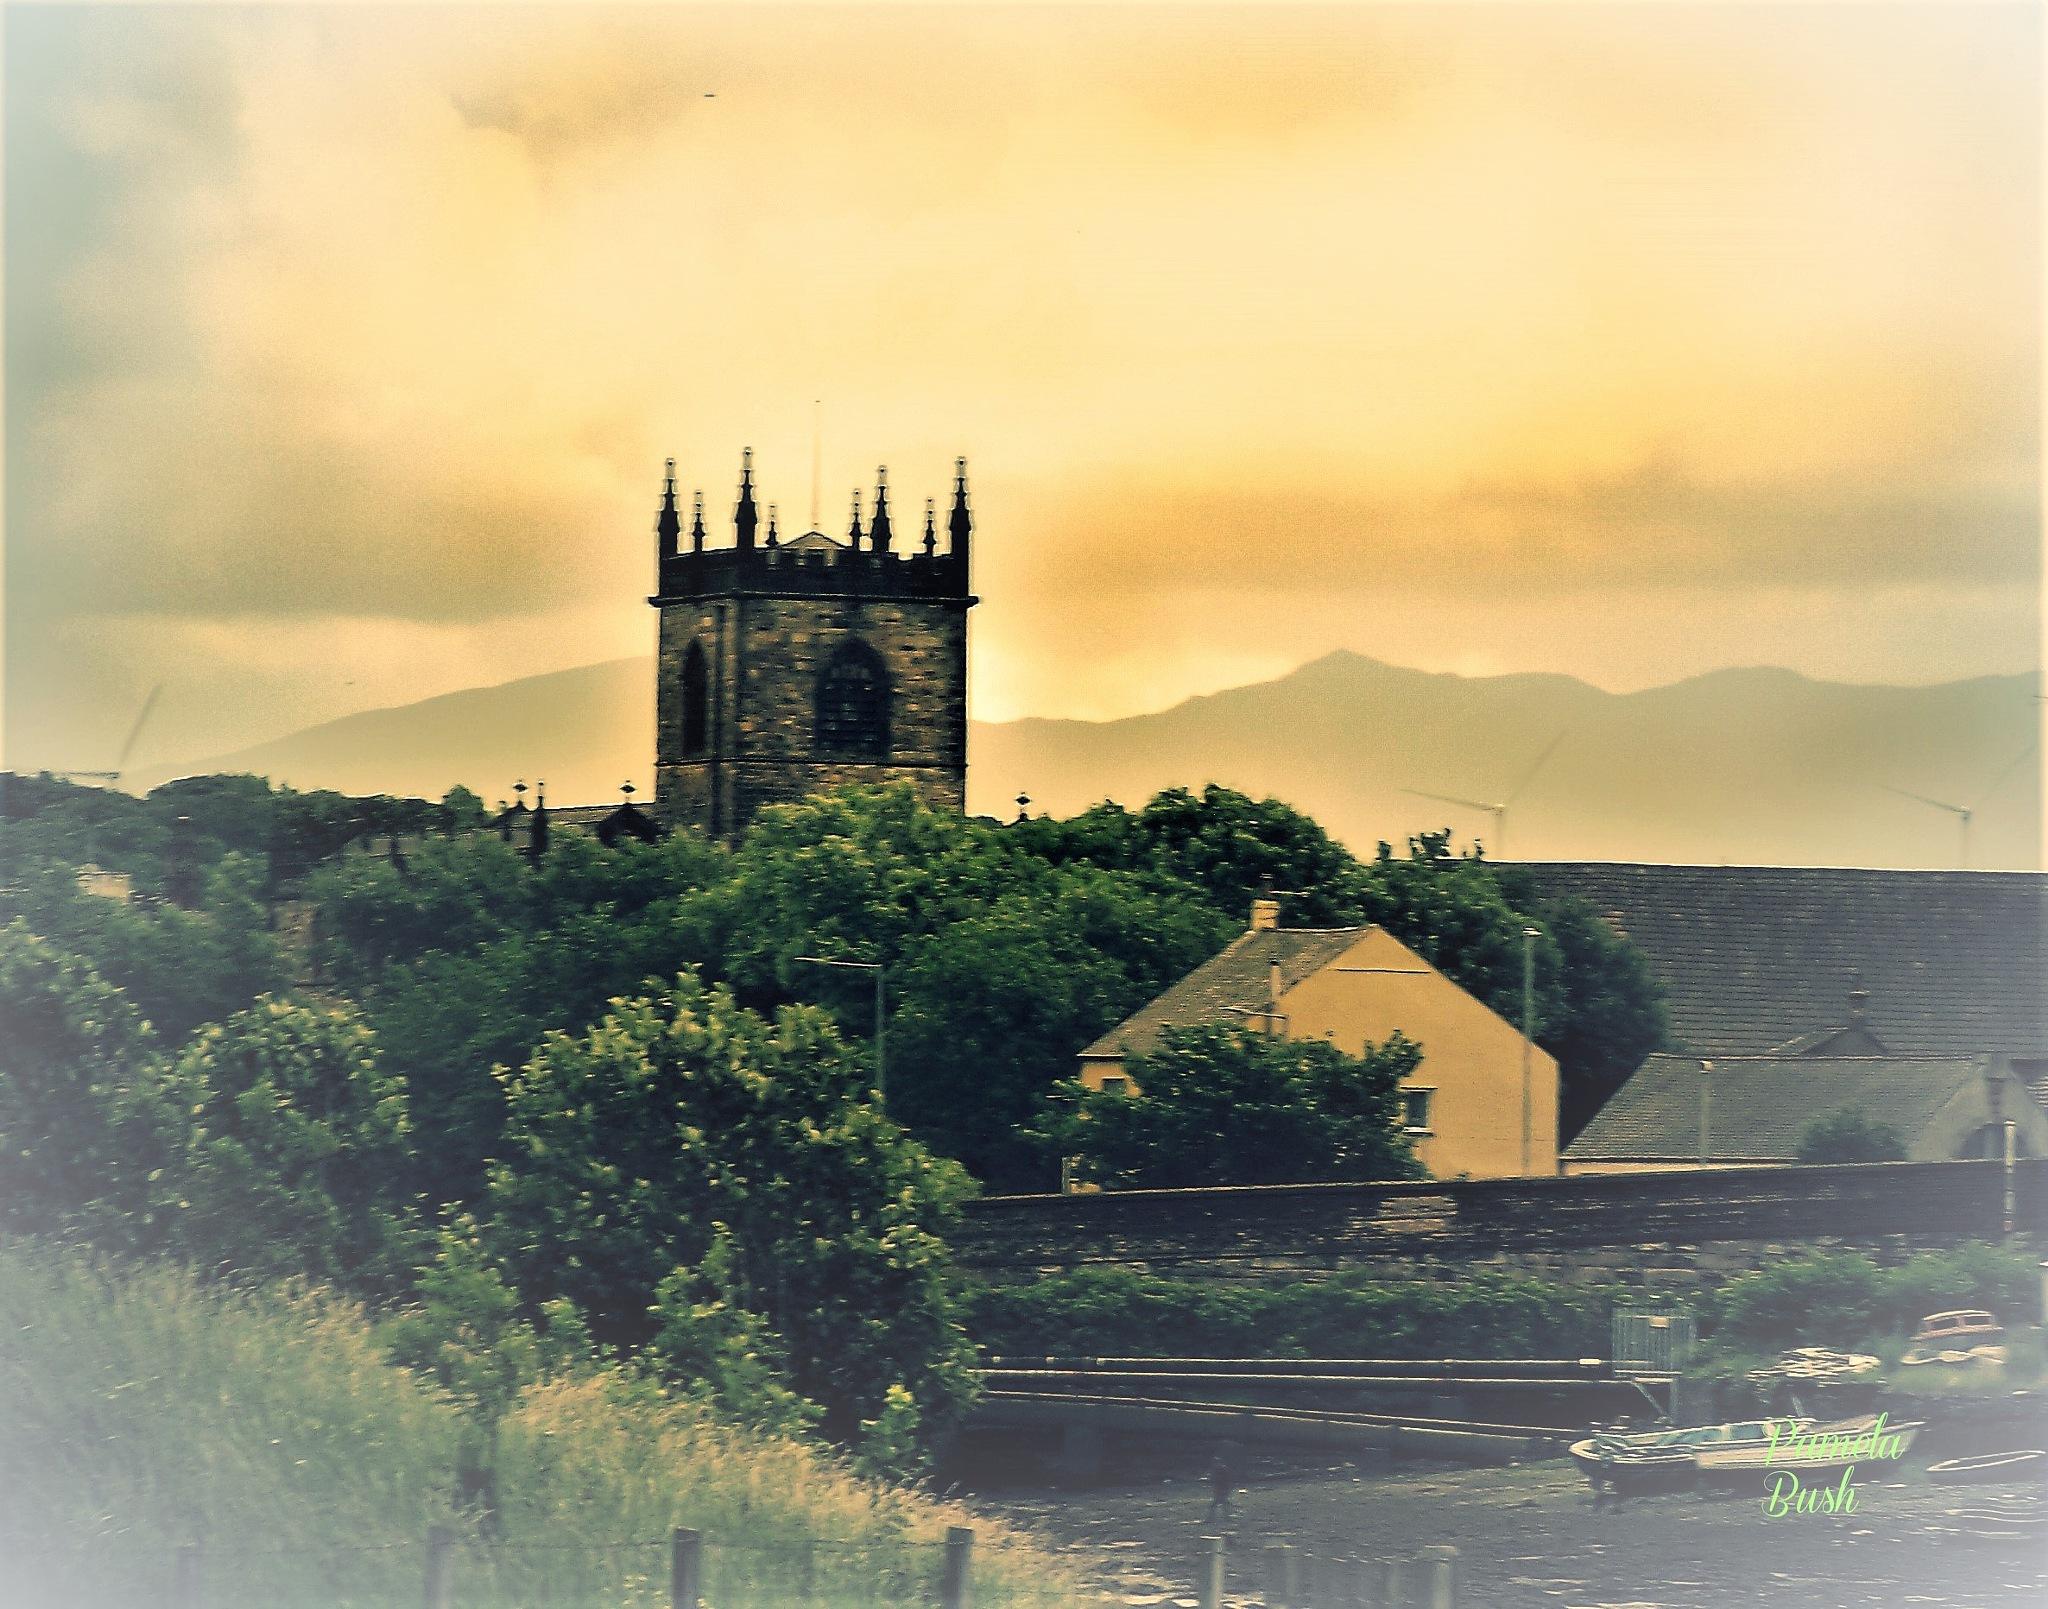 St Michaels Church by Cumbria Ladd